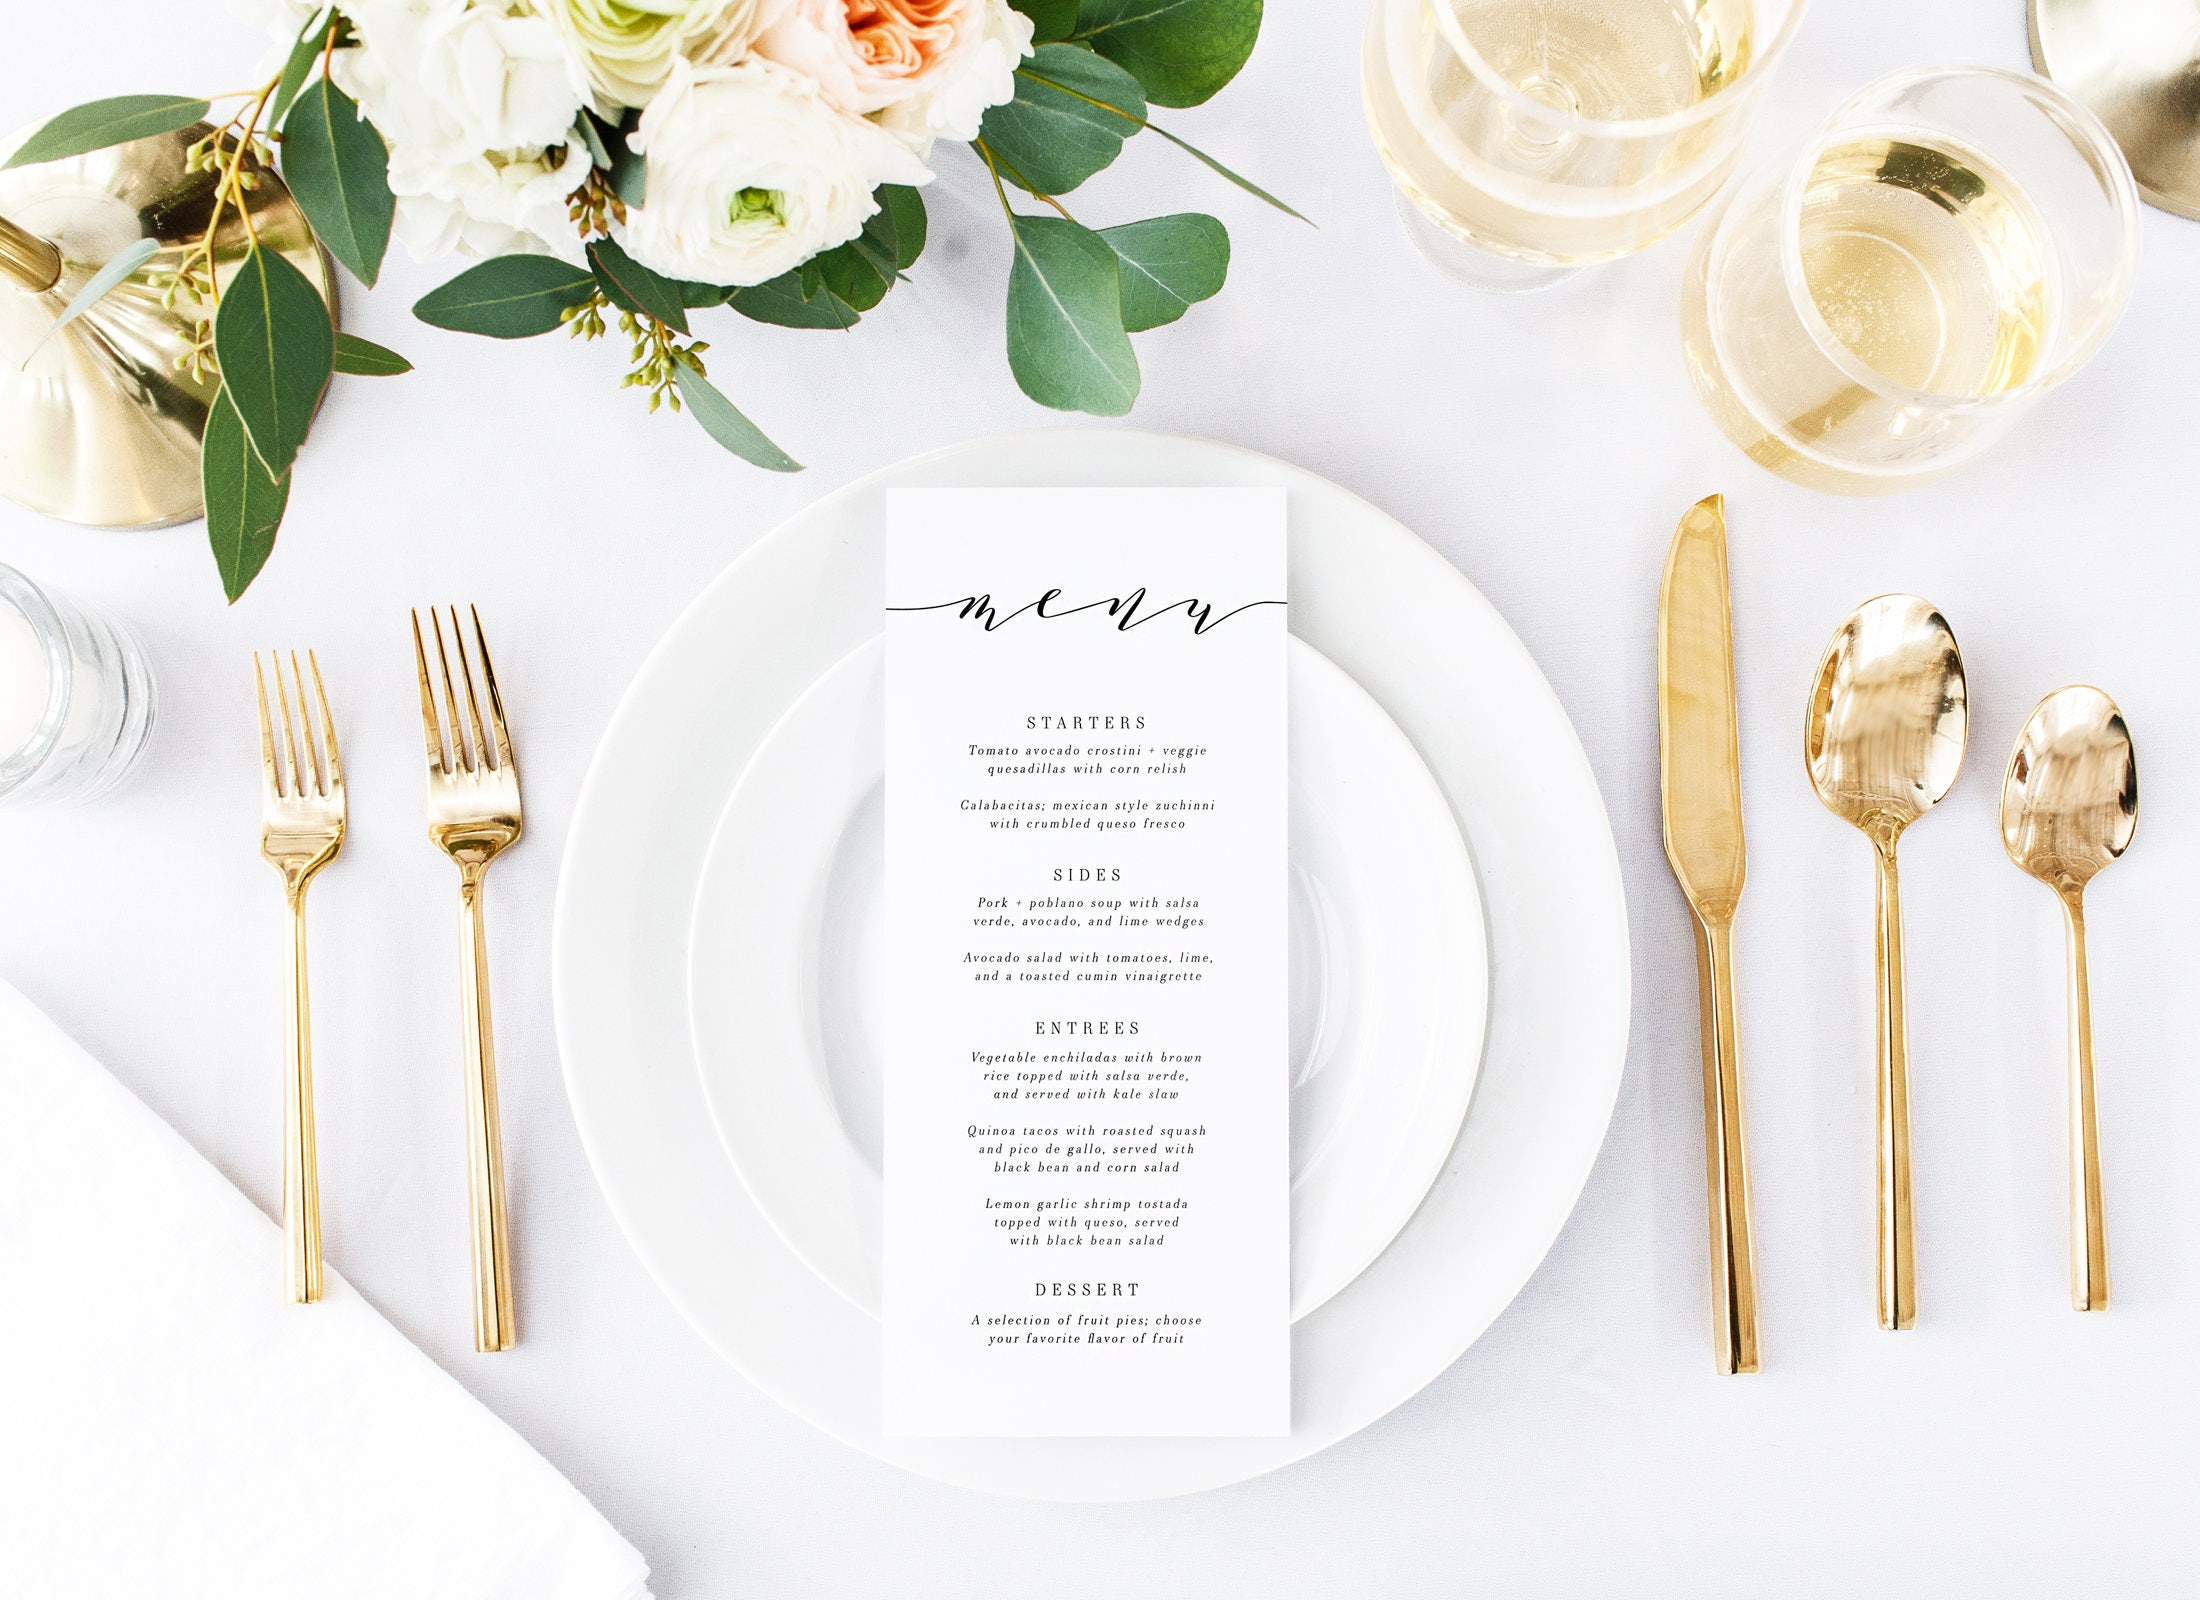 Printing menus for wedding